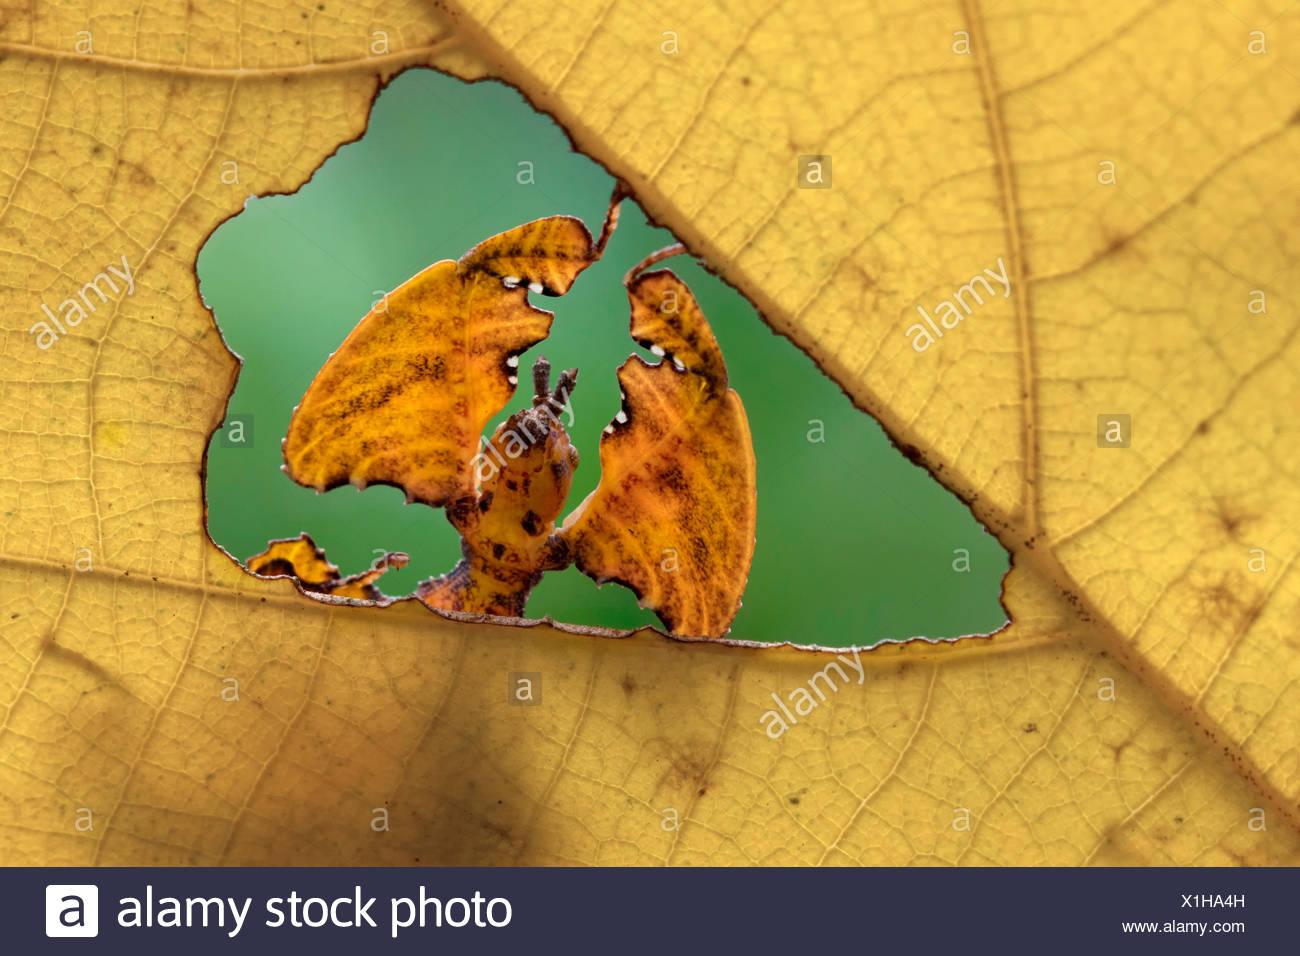 Retrato de una hoja a través de phyllium Foto de stock